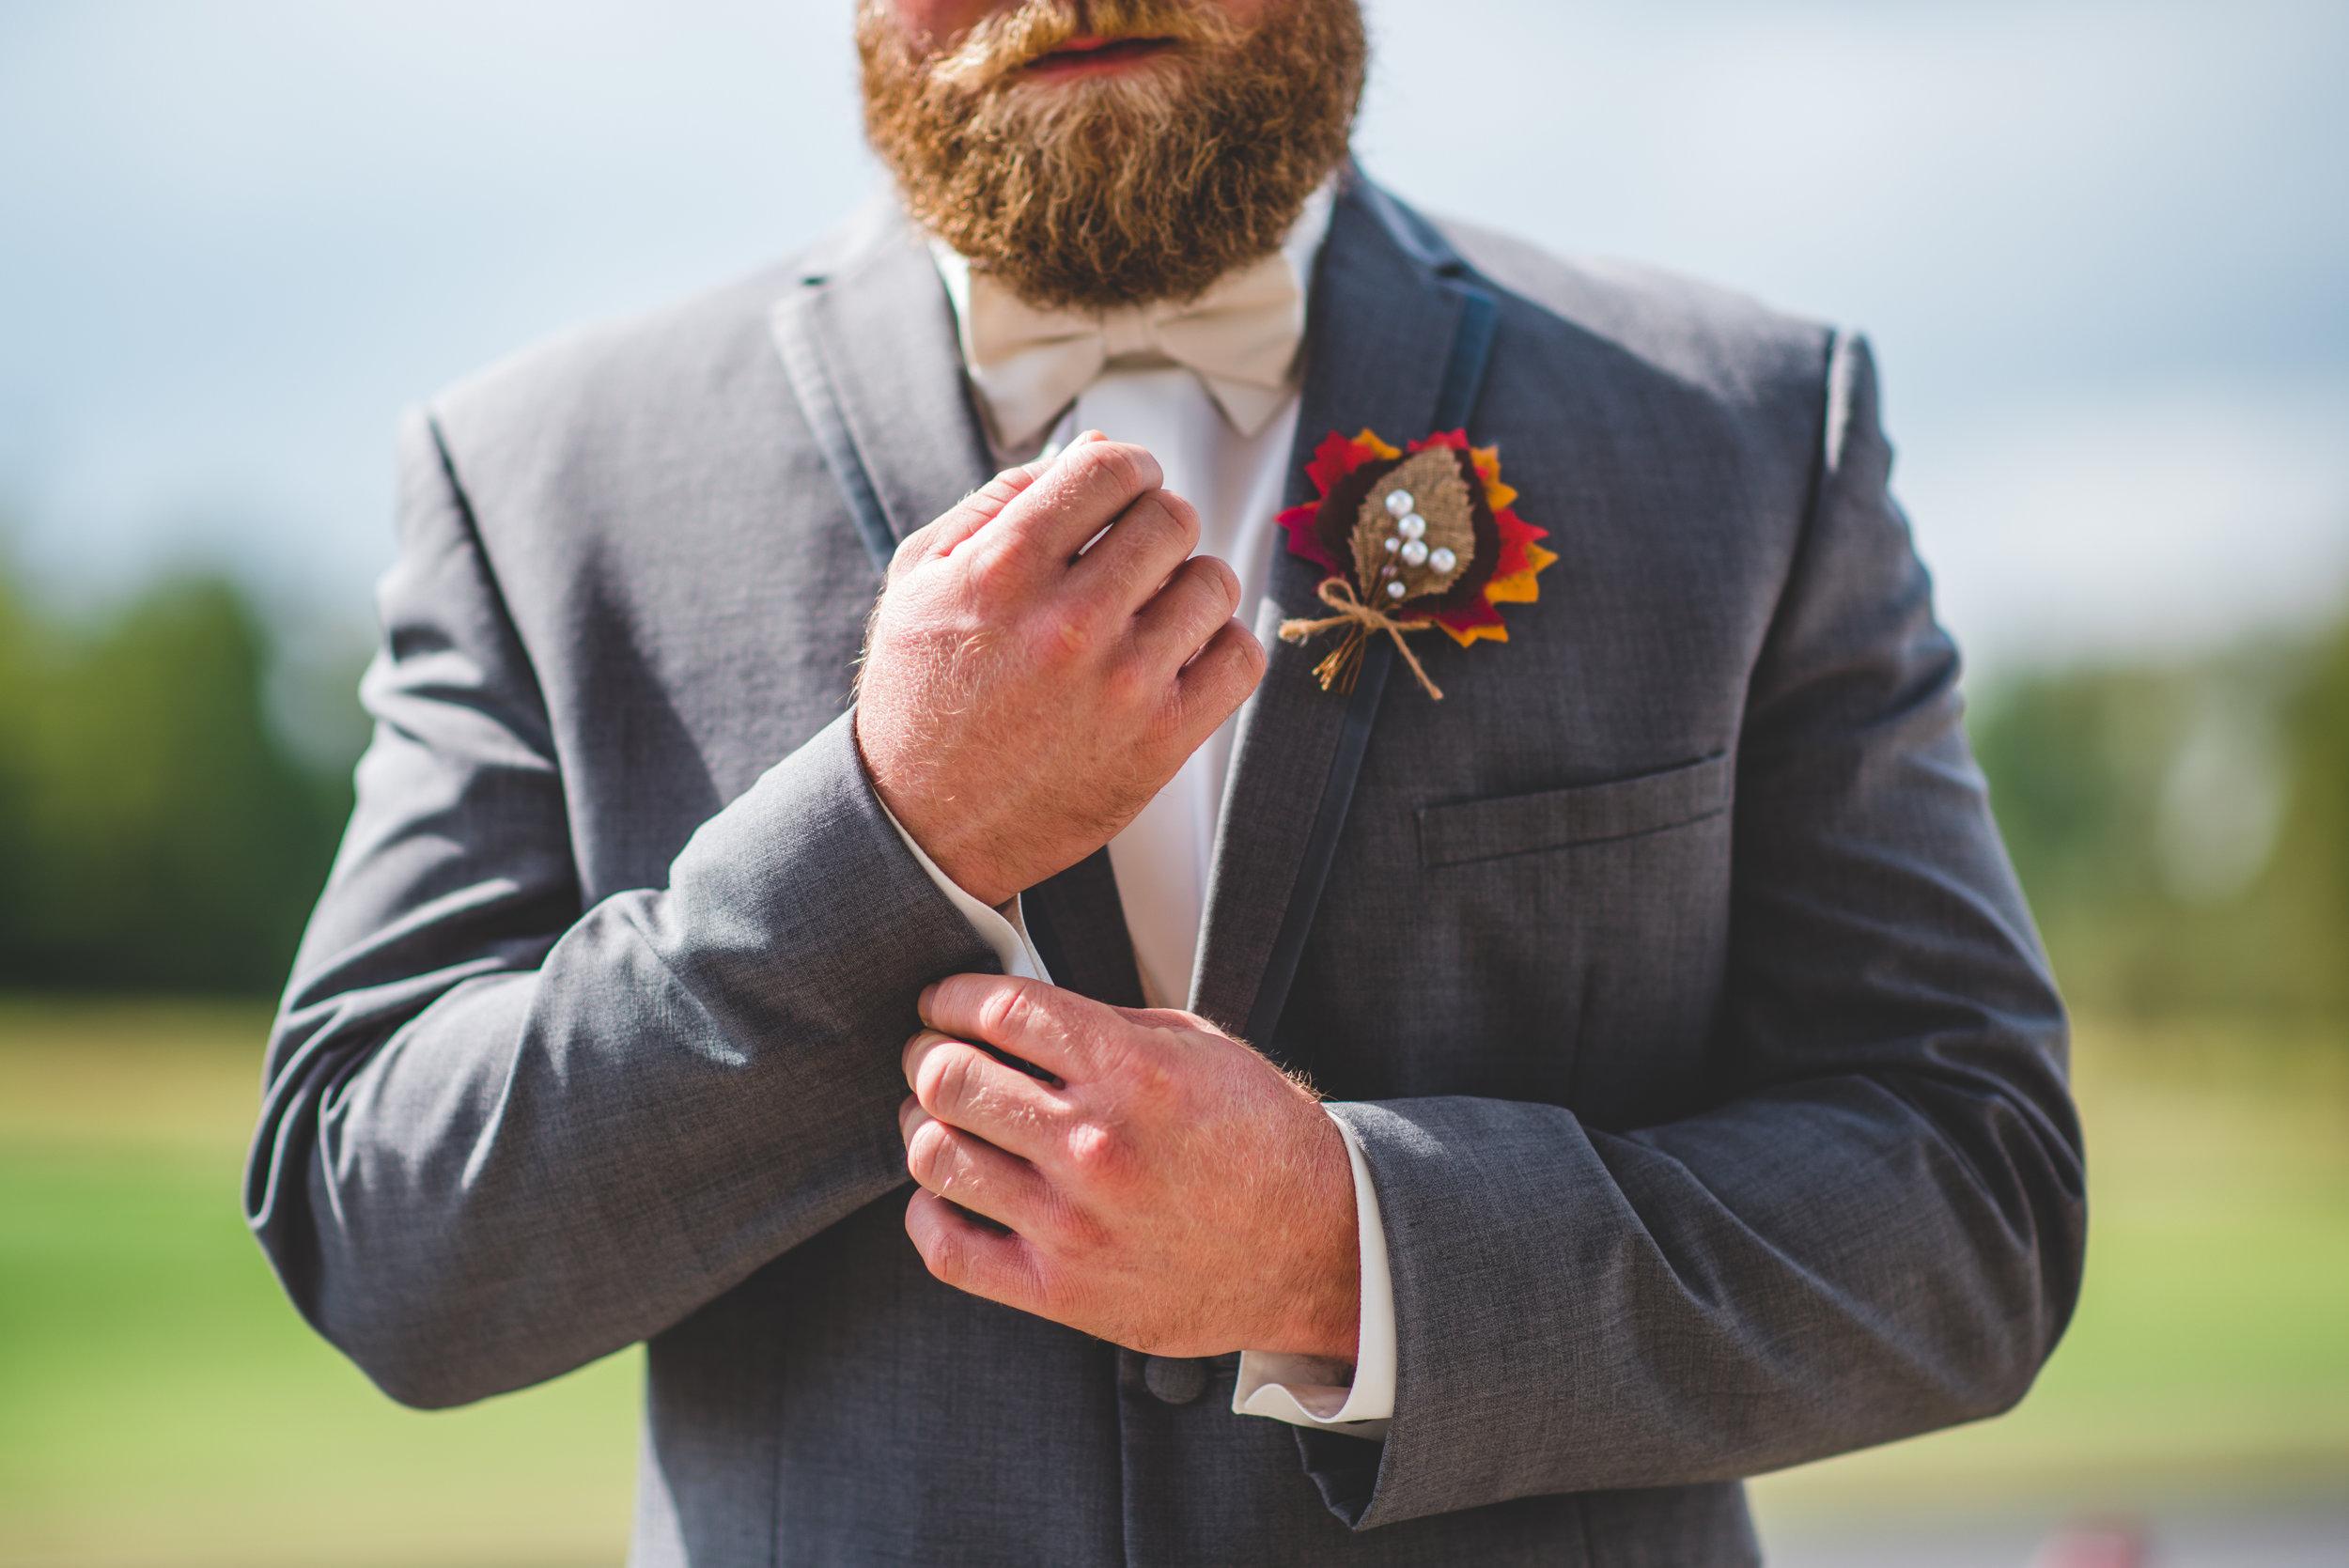 CCW - Creative Cure Weddings - Marissa and Nick - Southern Illinois Wedding Photography-5.jpg